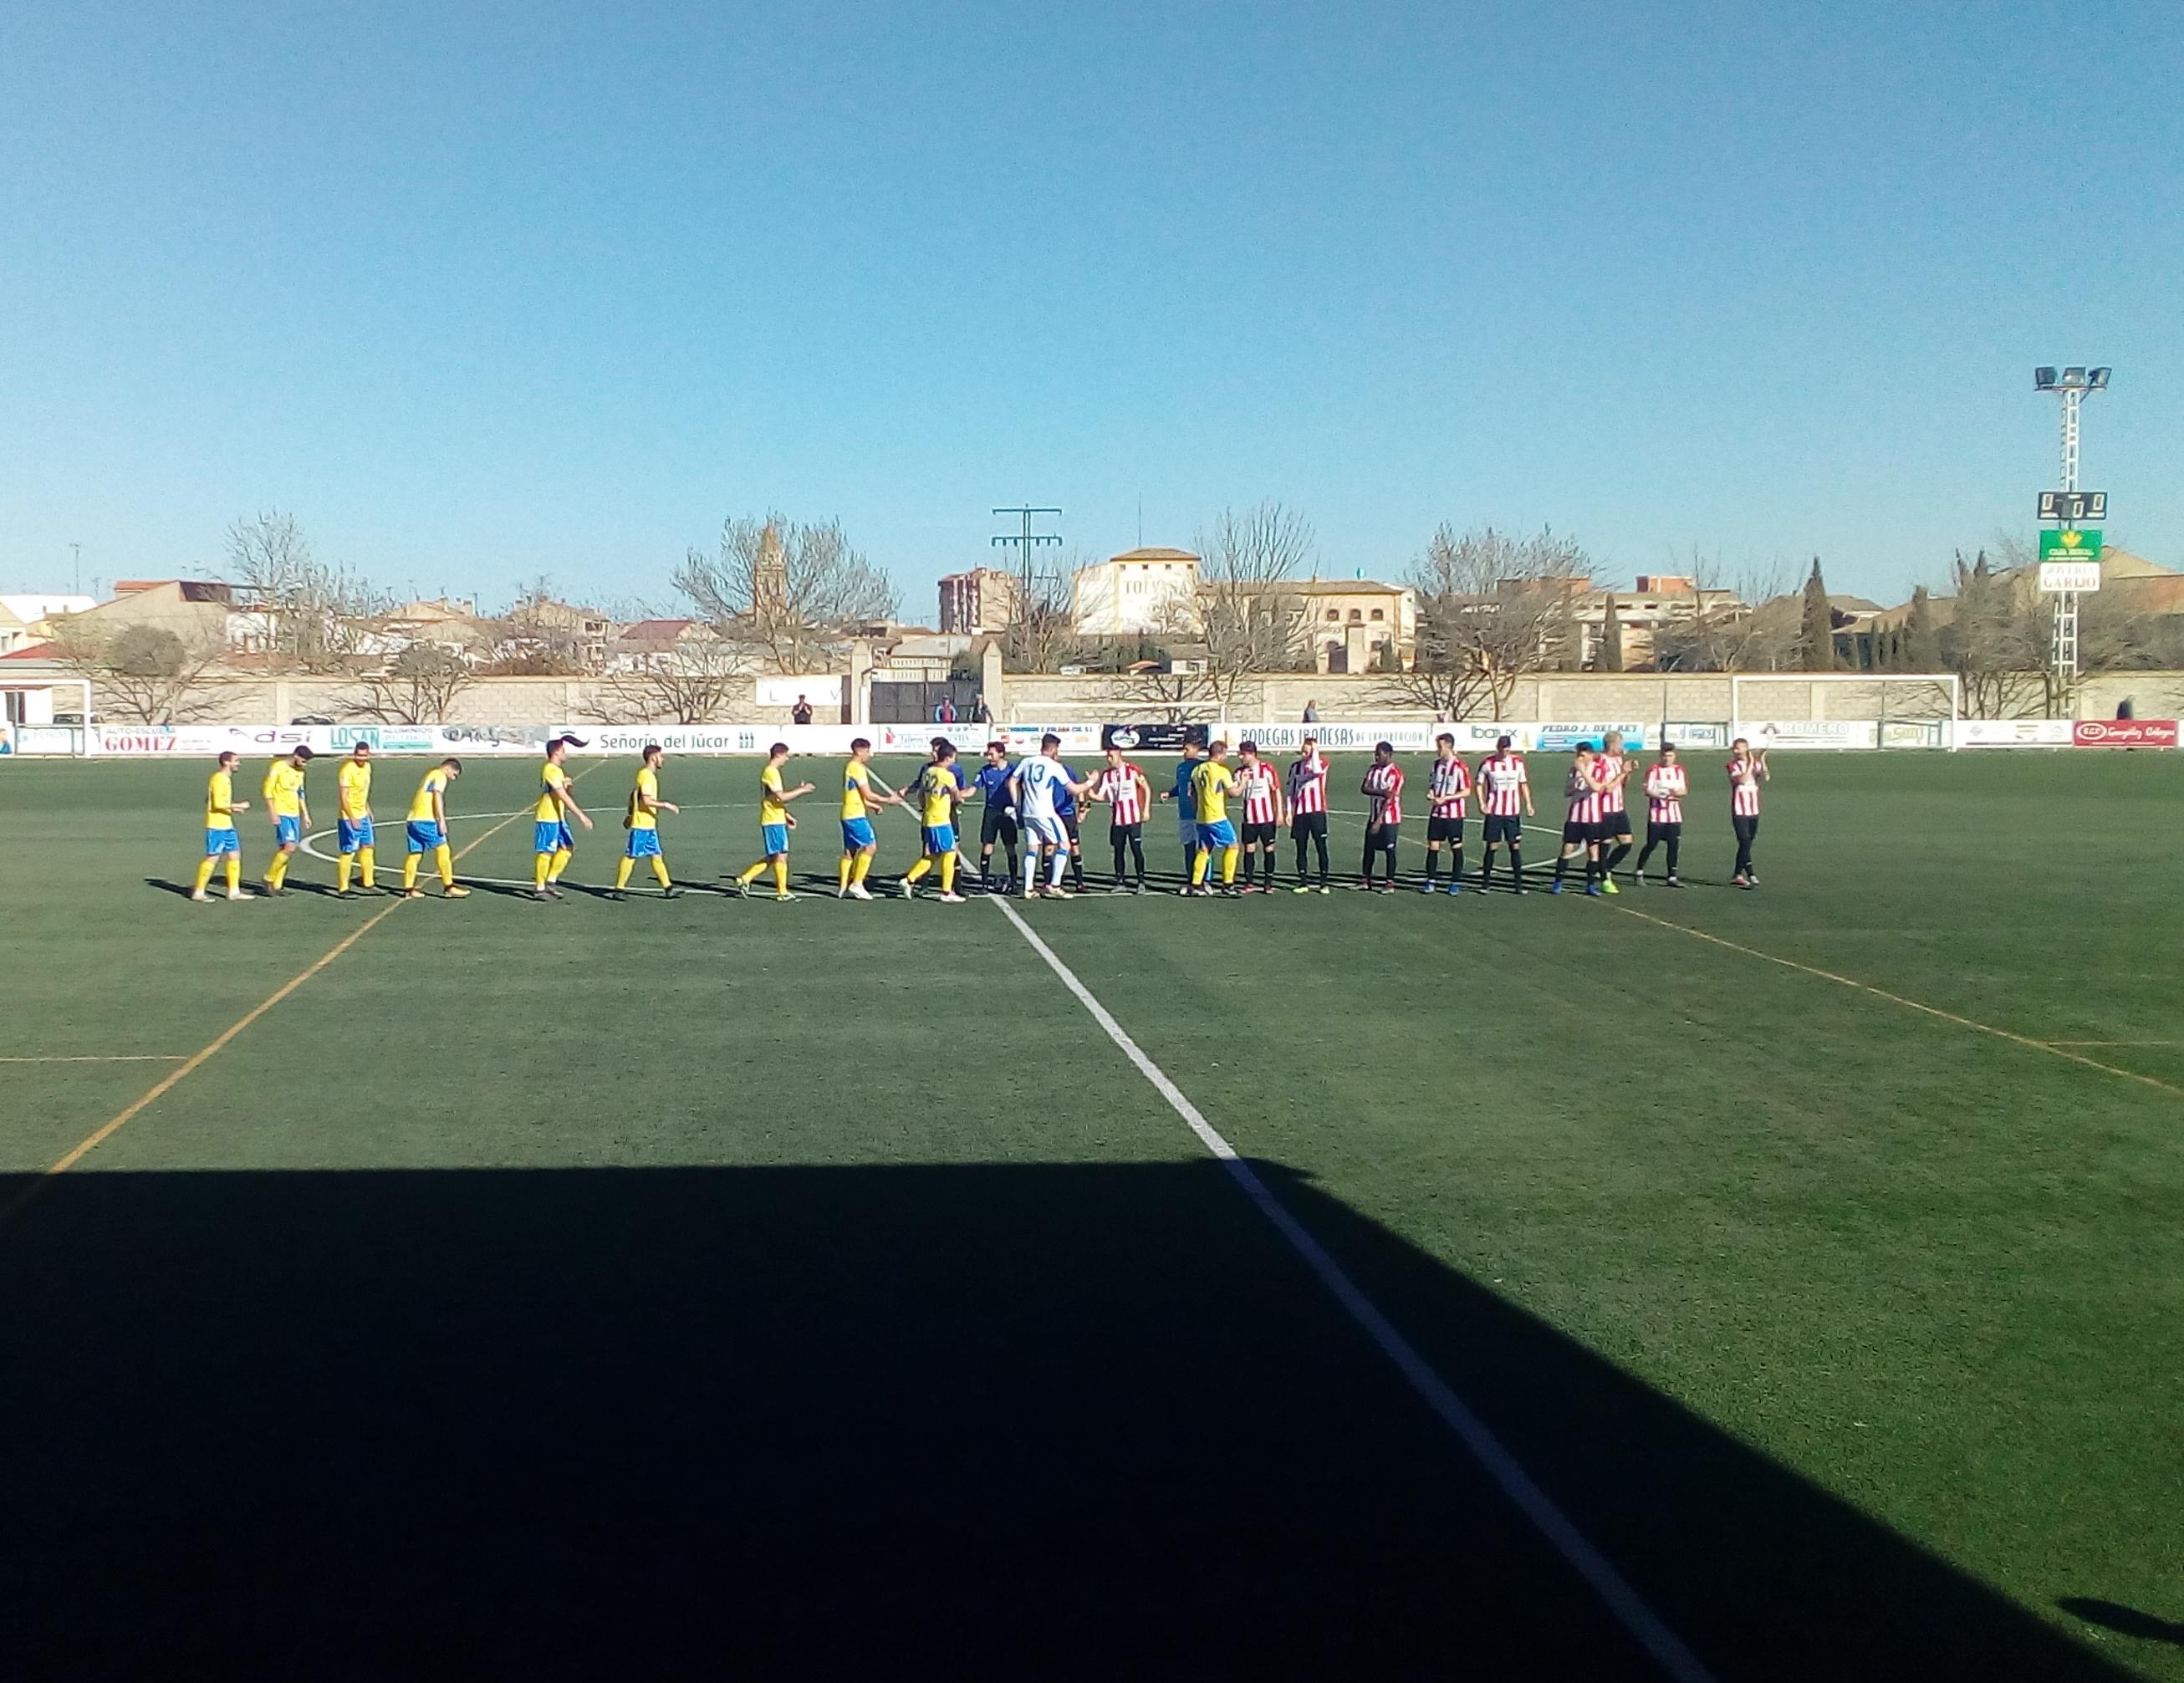 Atlético Ibañés - CF La Solana